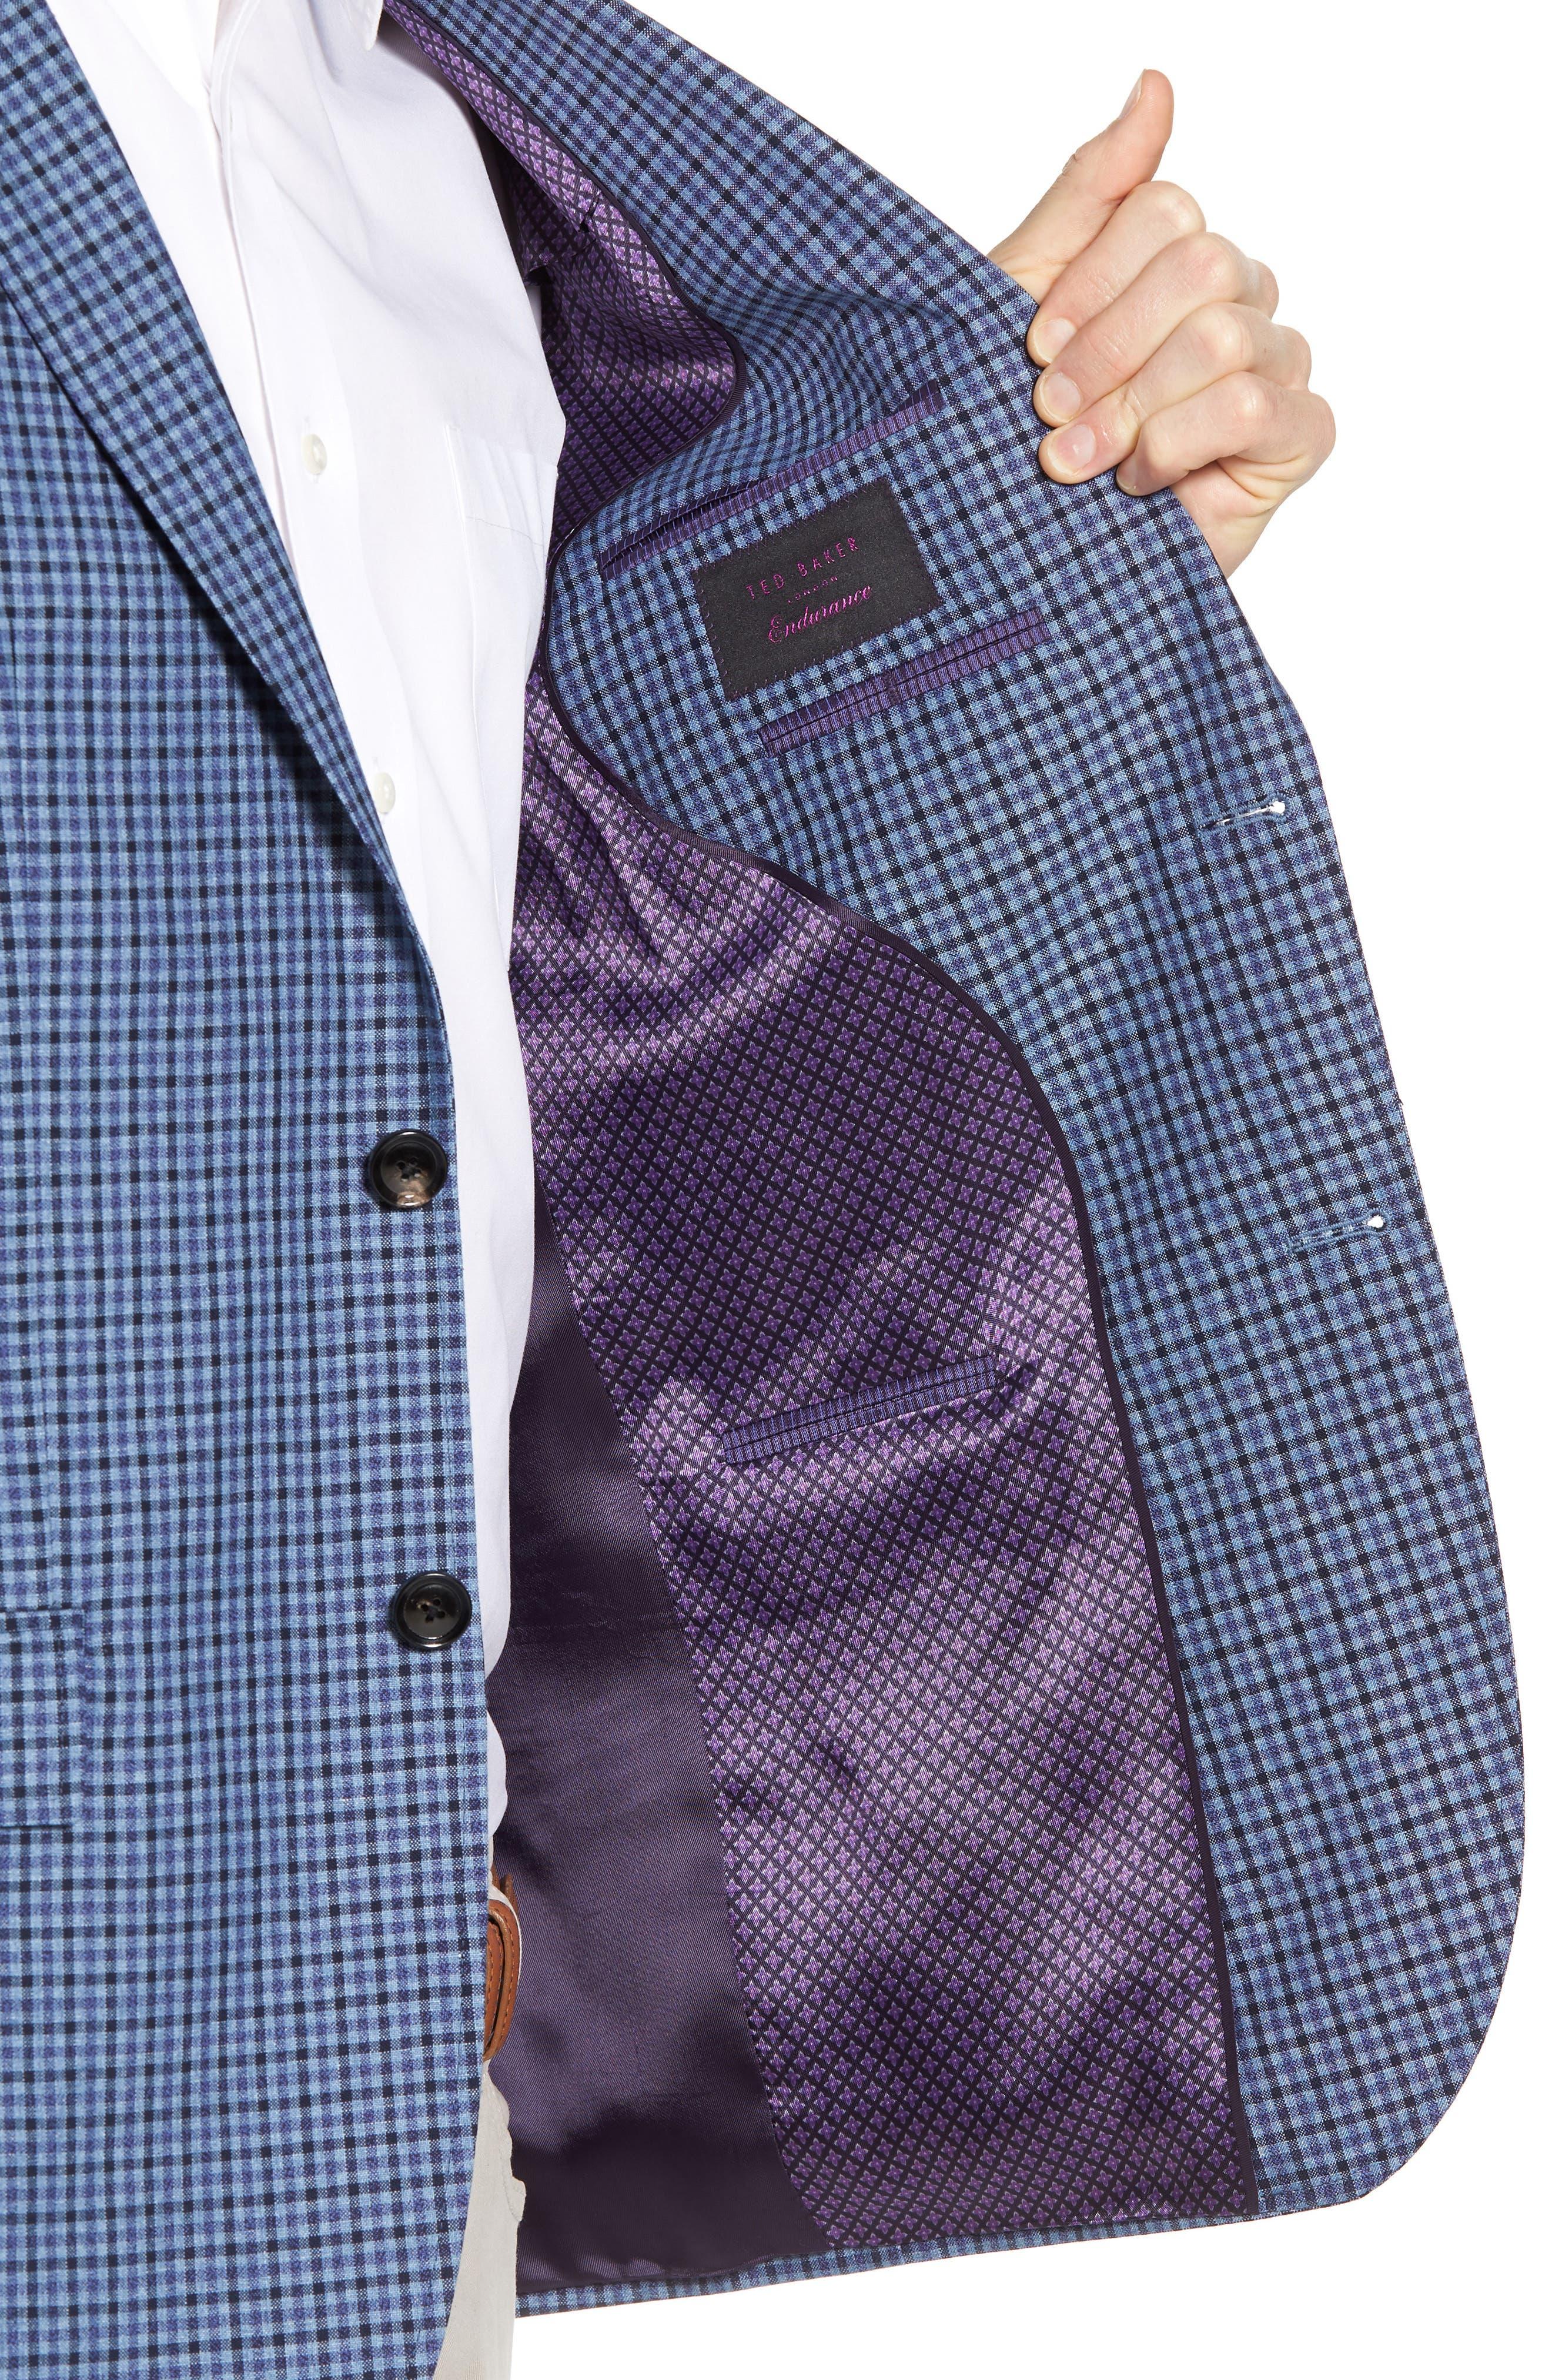 Jay Trim Fit Check Wool & Linen Sport Coat,                             Alternate thumbnail 4, color,                             400